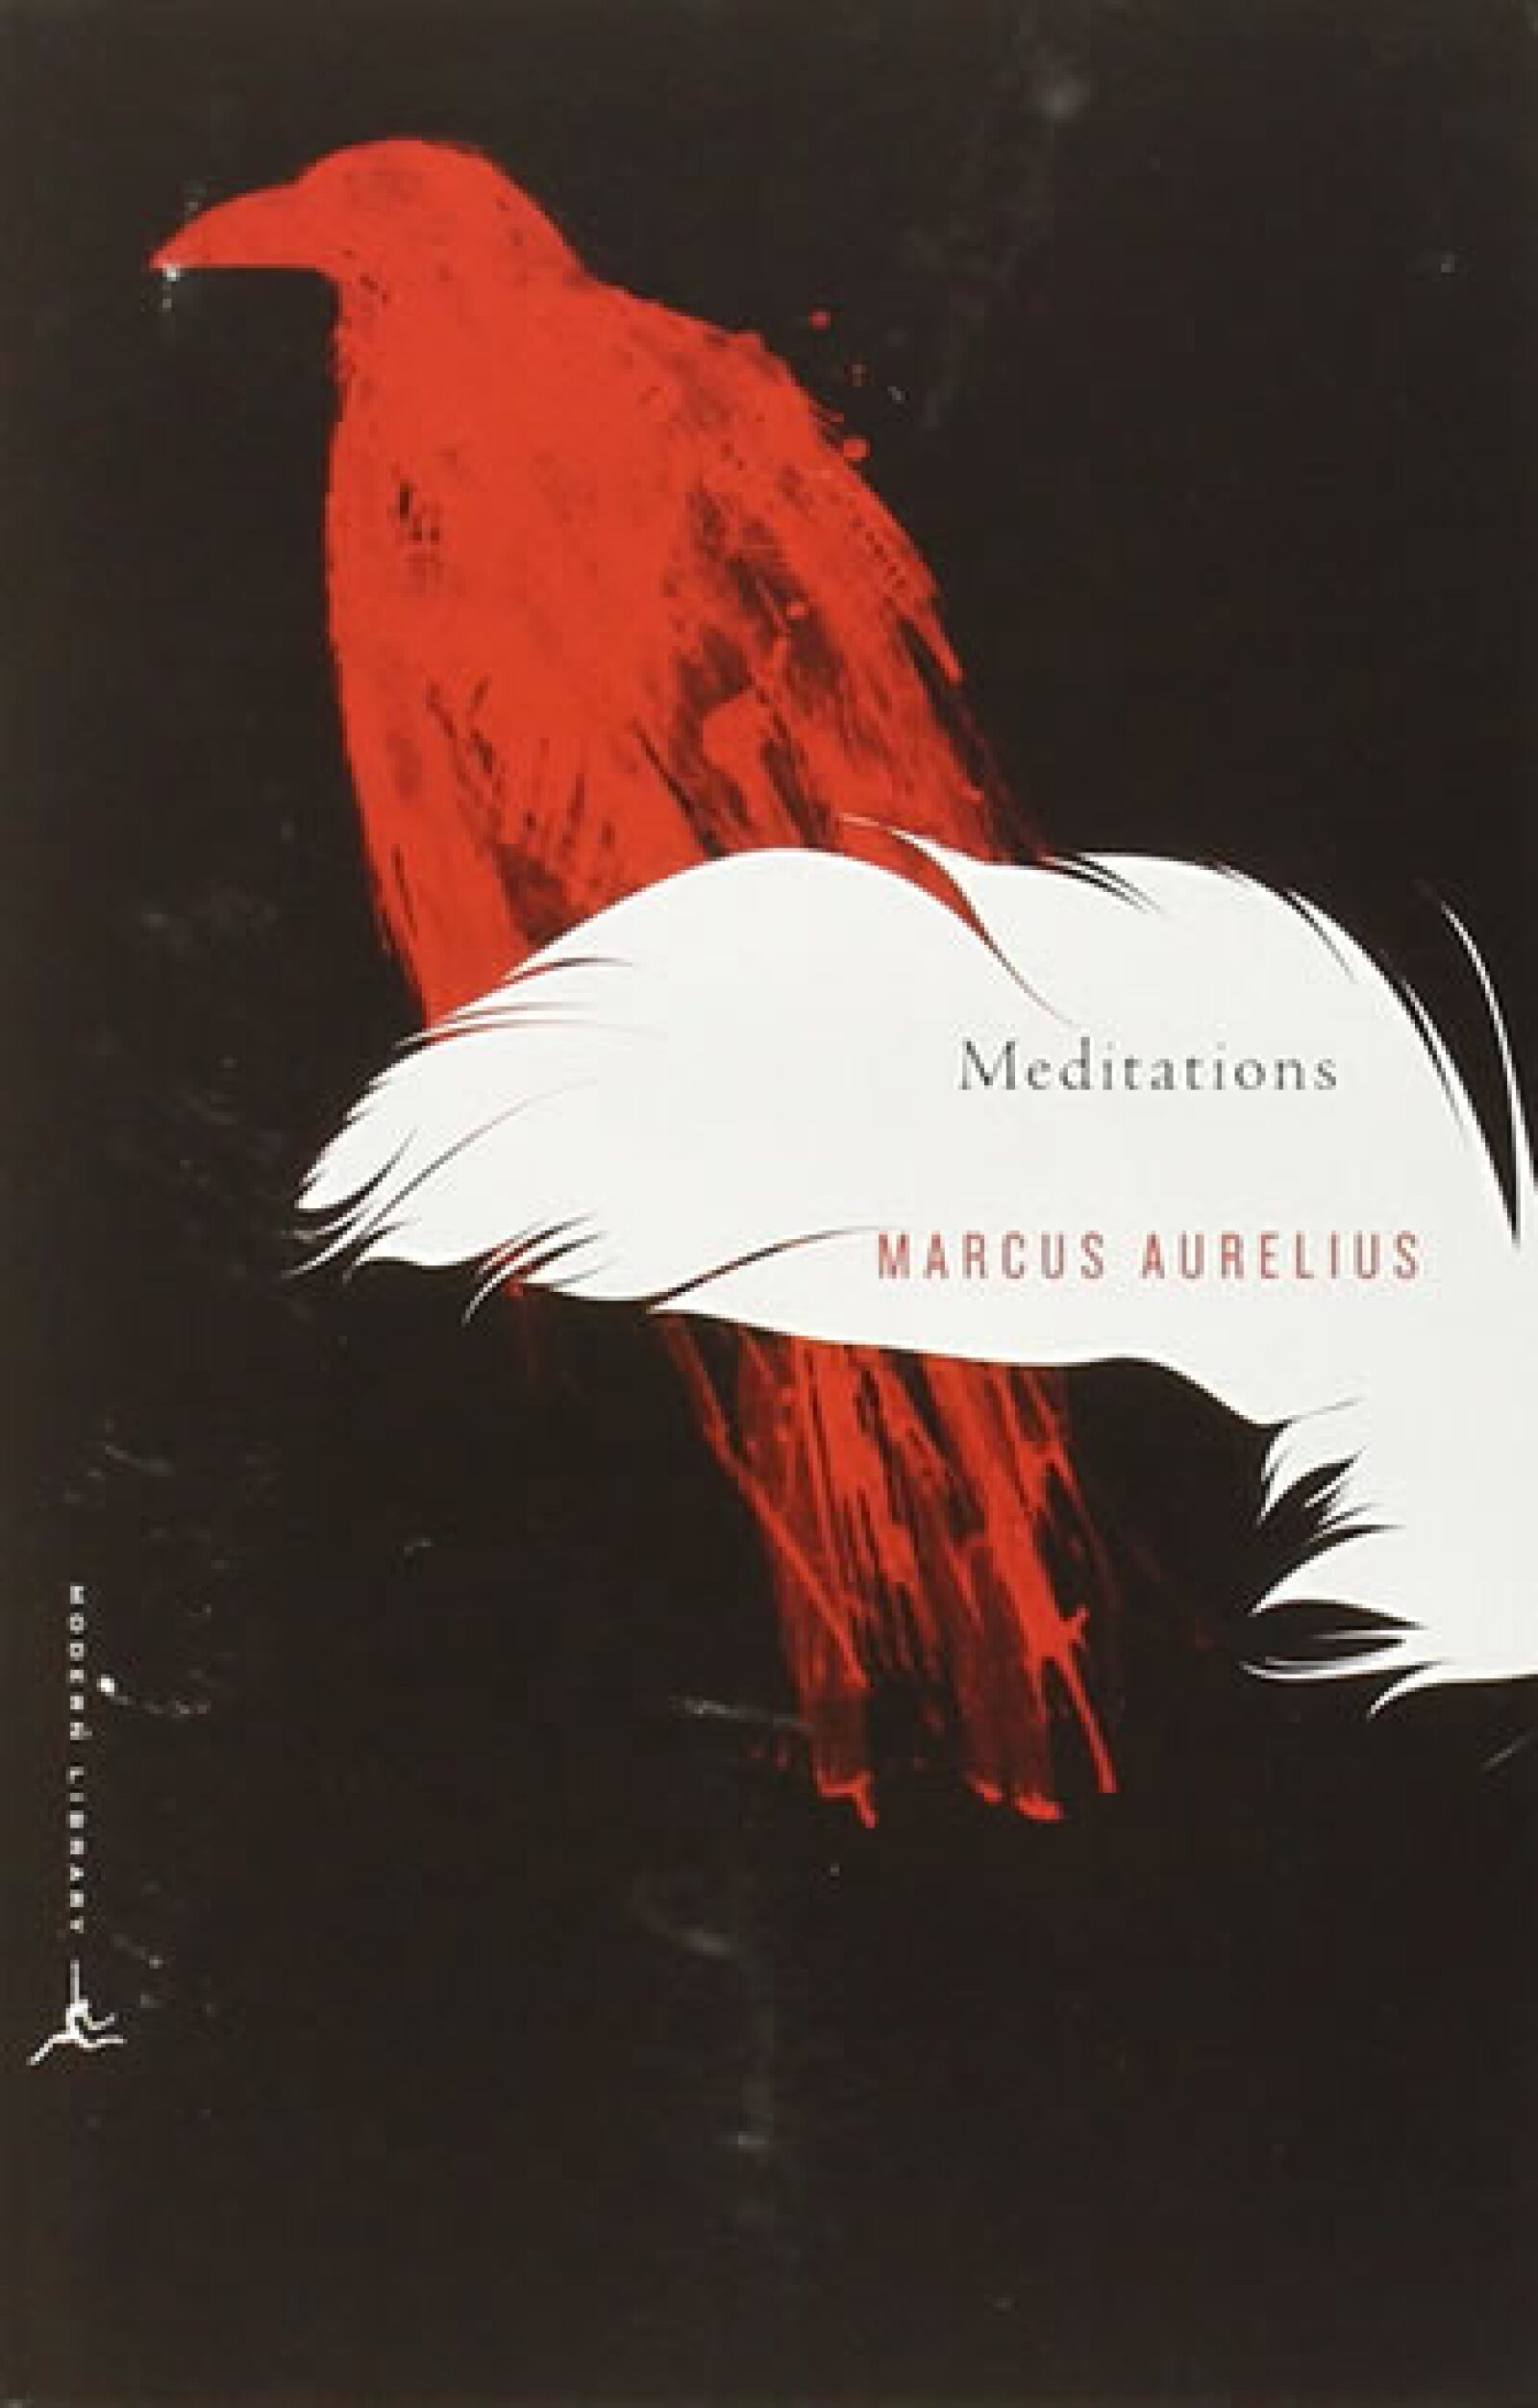 Meditaciones de Marcus Aurelius